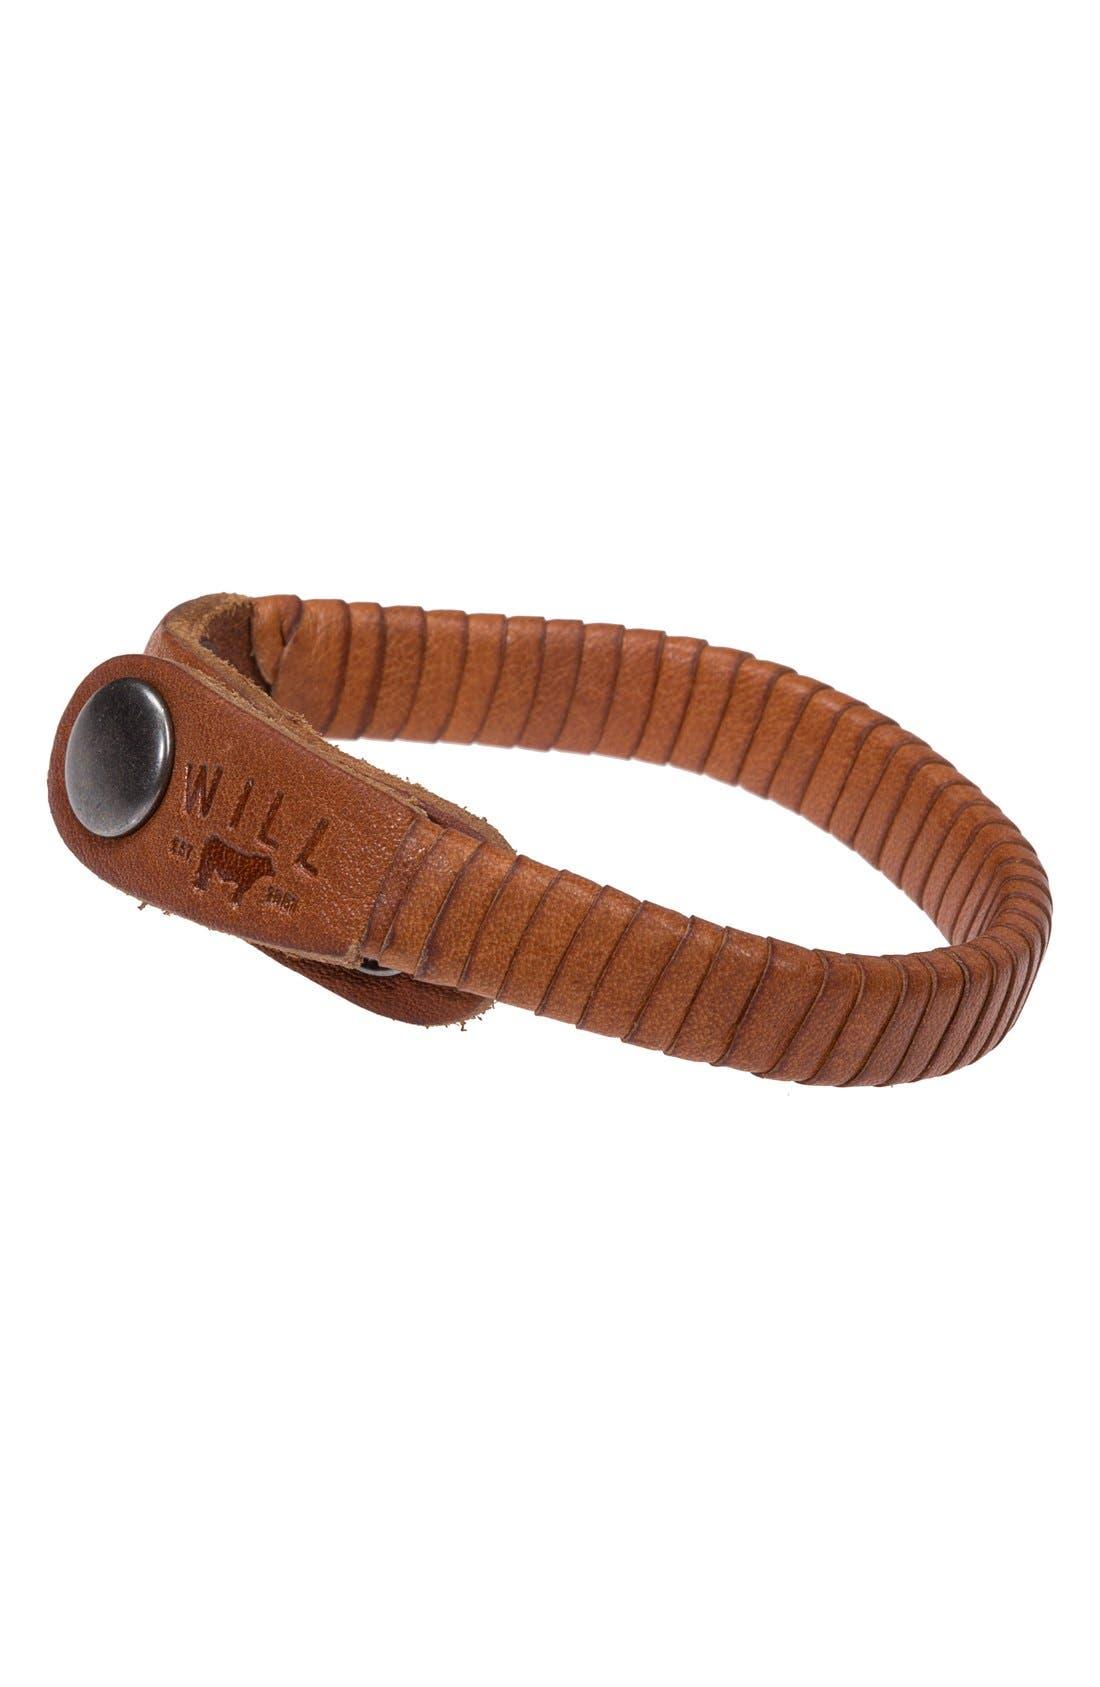 Alternate Image 1 Selected - Will Leather Goods 'Peddler' Bracelet